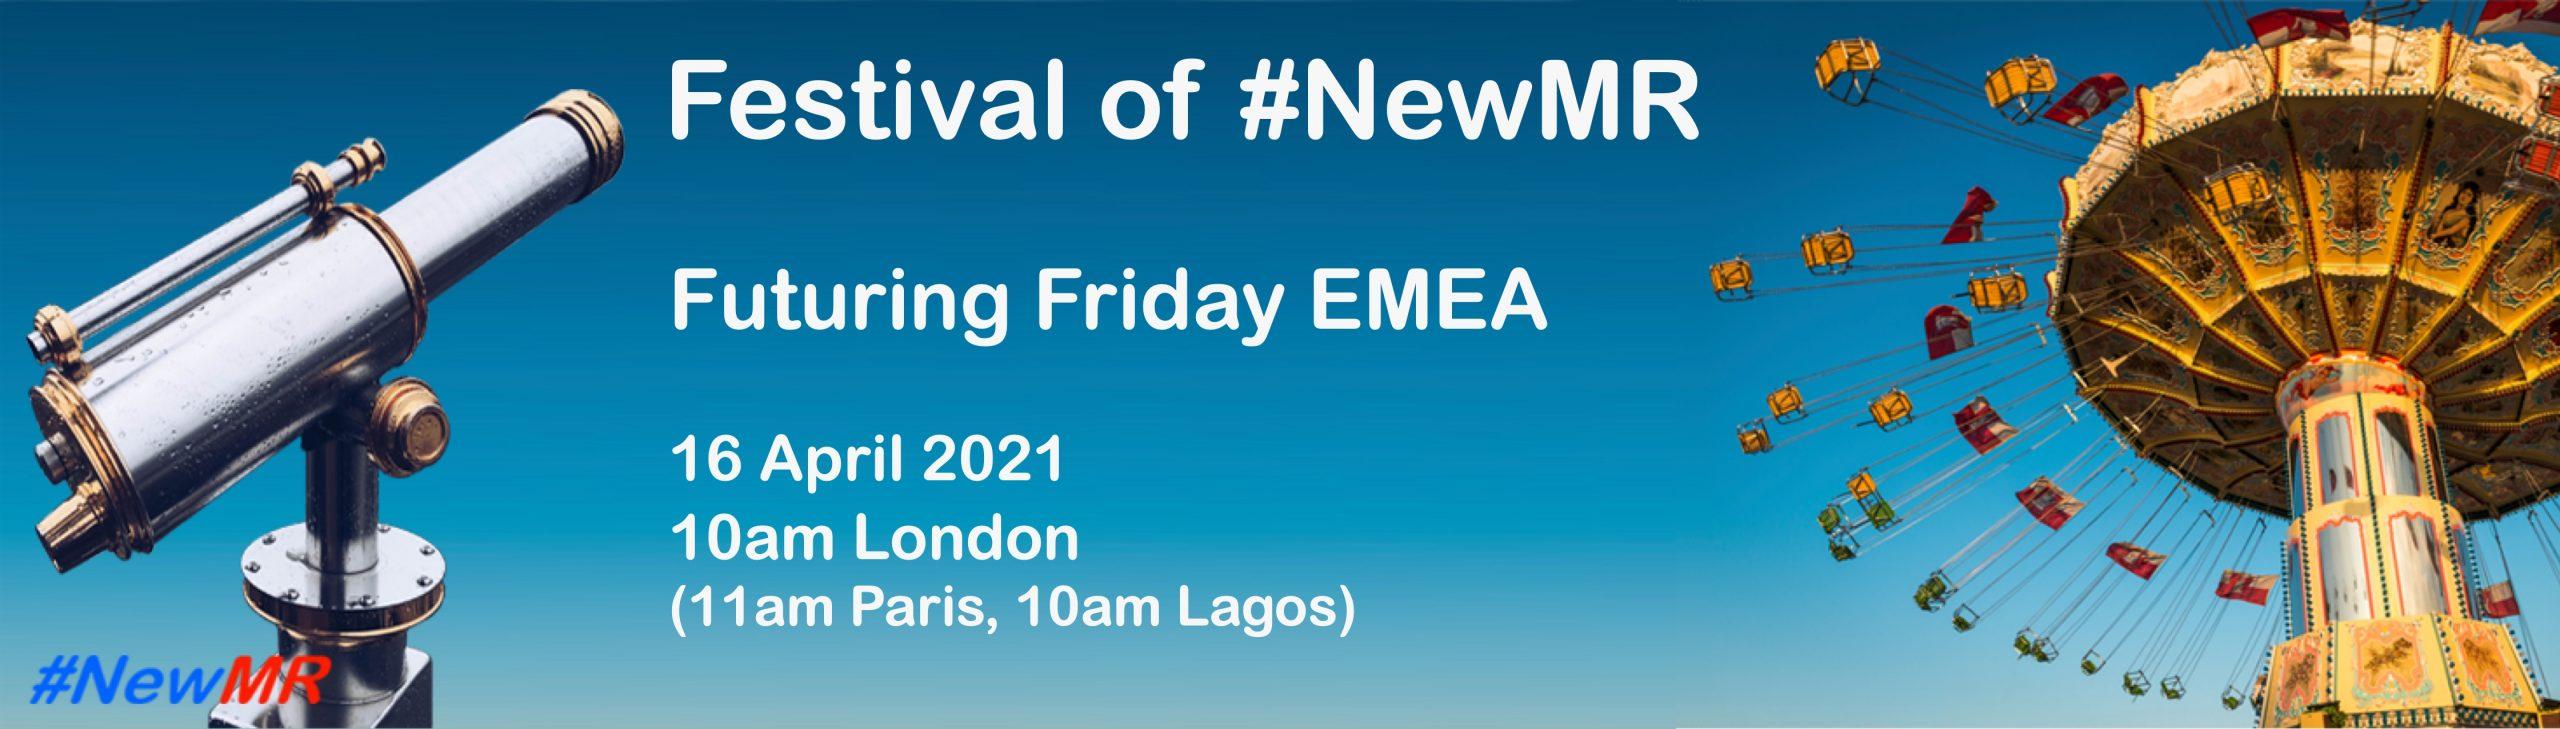 Banner for Futuring Friday EMEA Webinar 2021